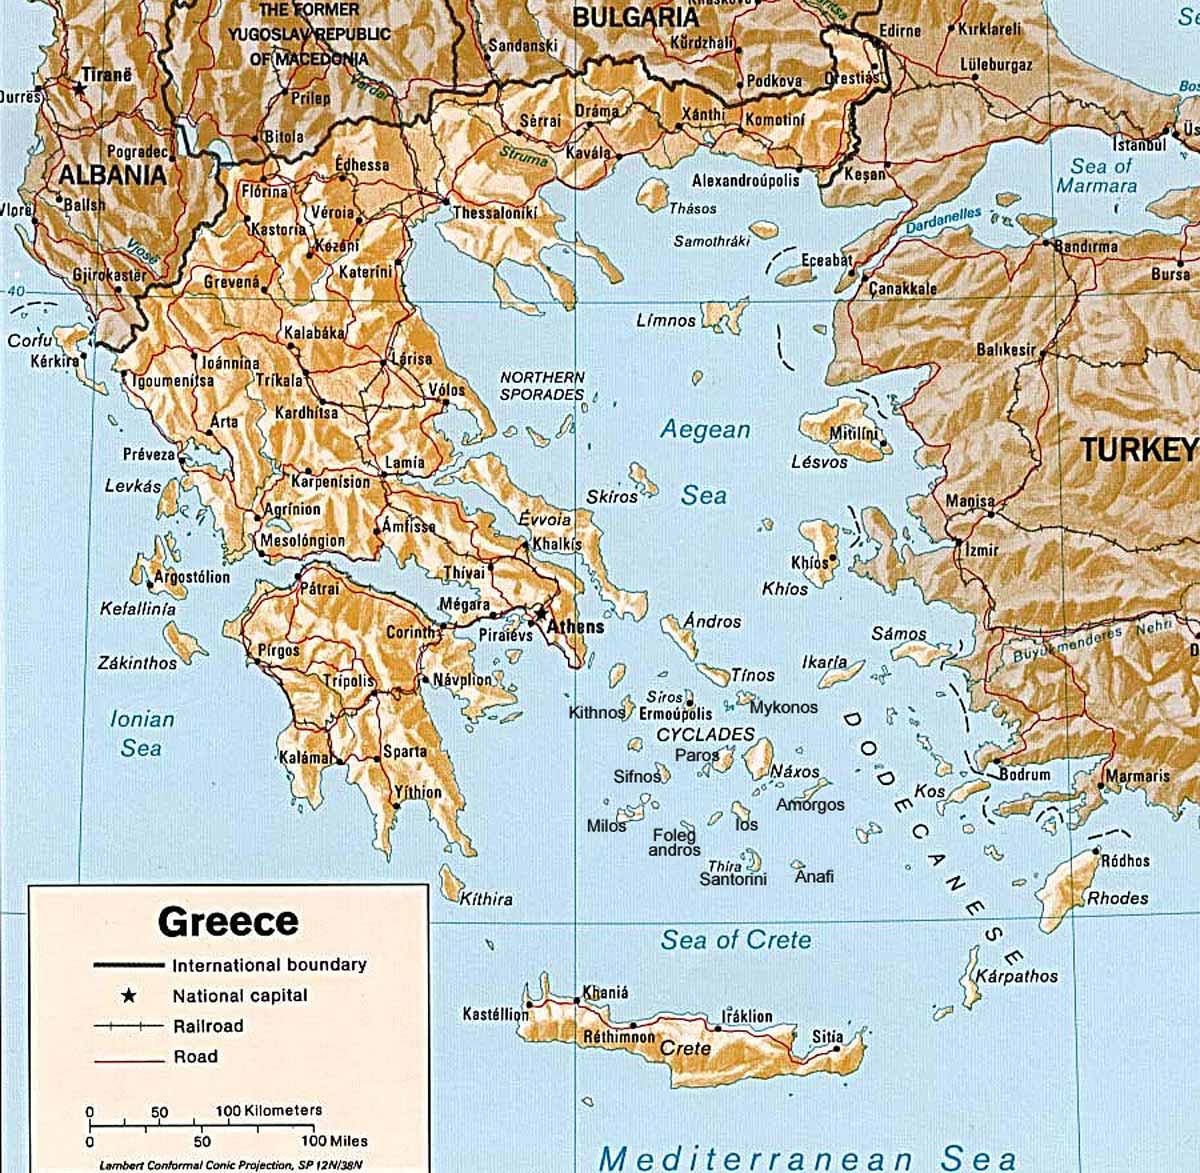 Die Welt: Το Grexit θα κόστιζε στη Γερμανία πάνω από 70 δισ. ευρώ!